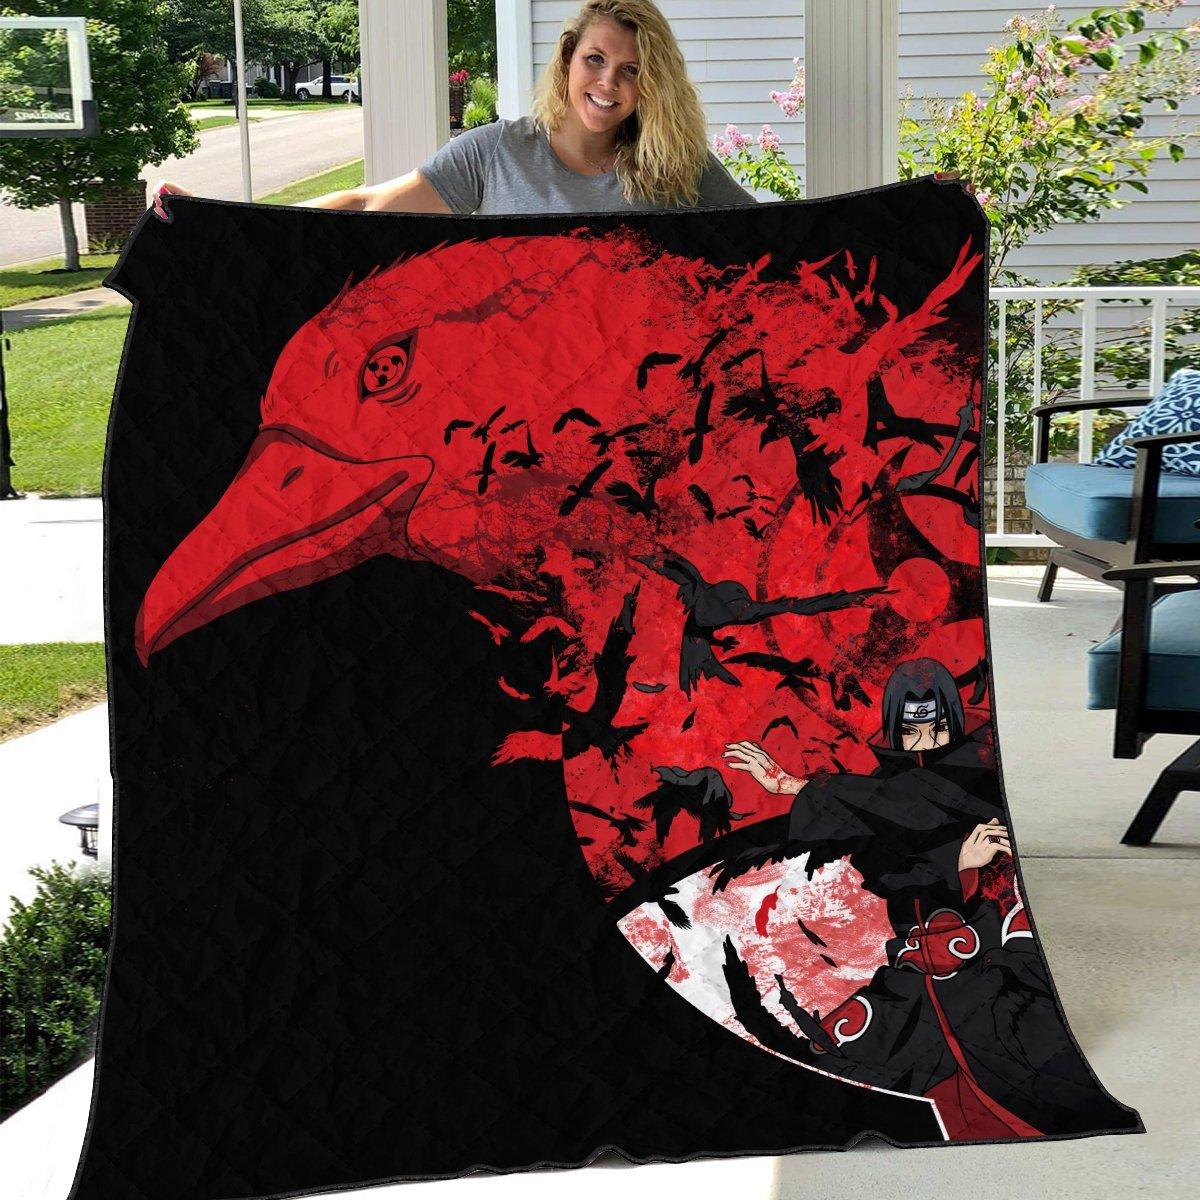 itachi summoning crow quilt blanket 268706 - Otaku Treat